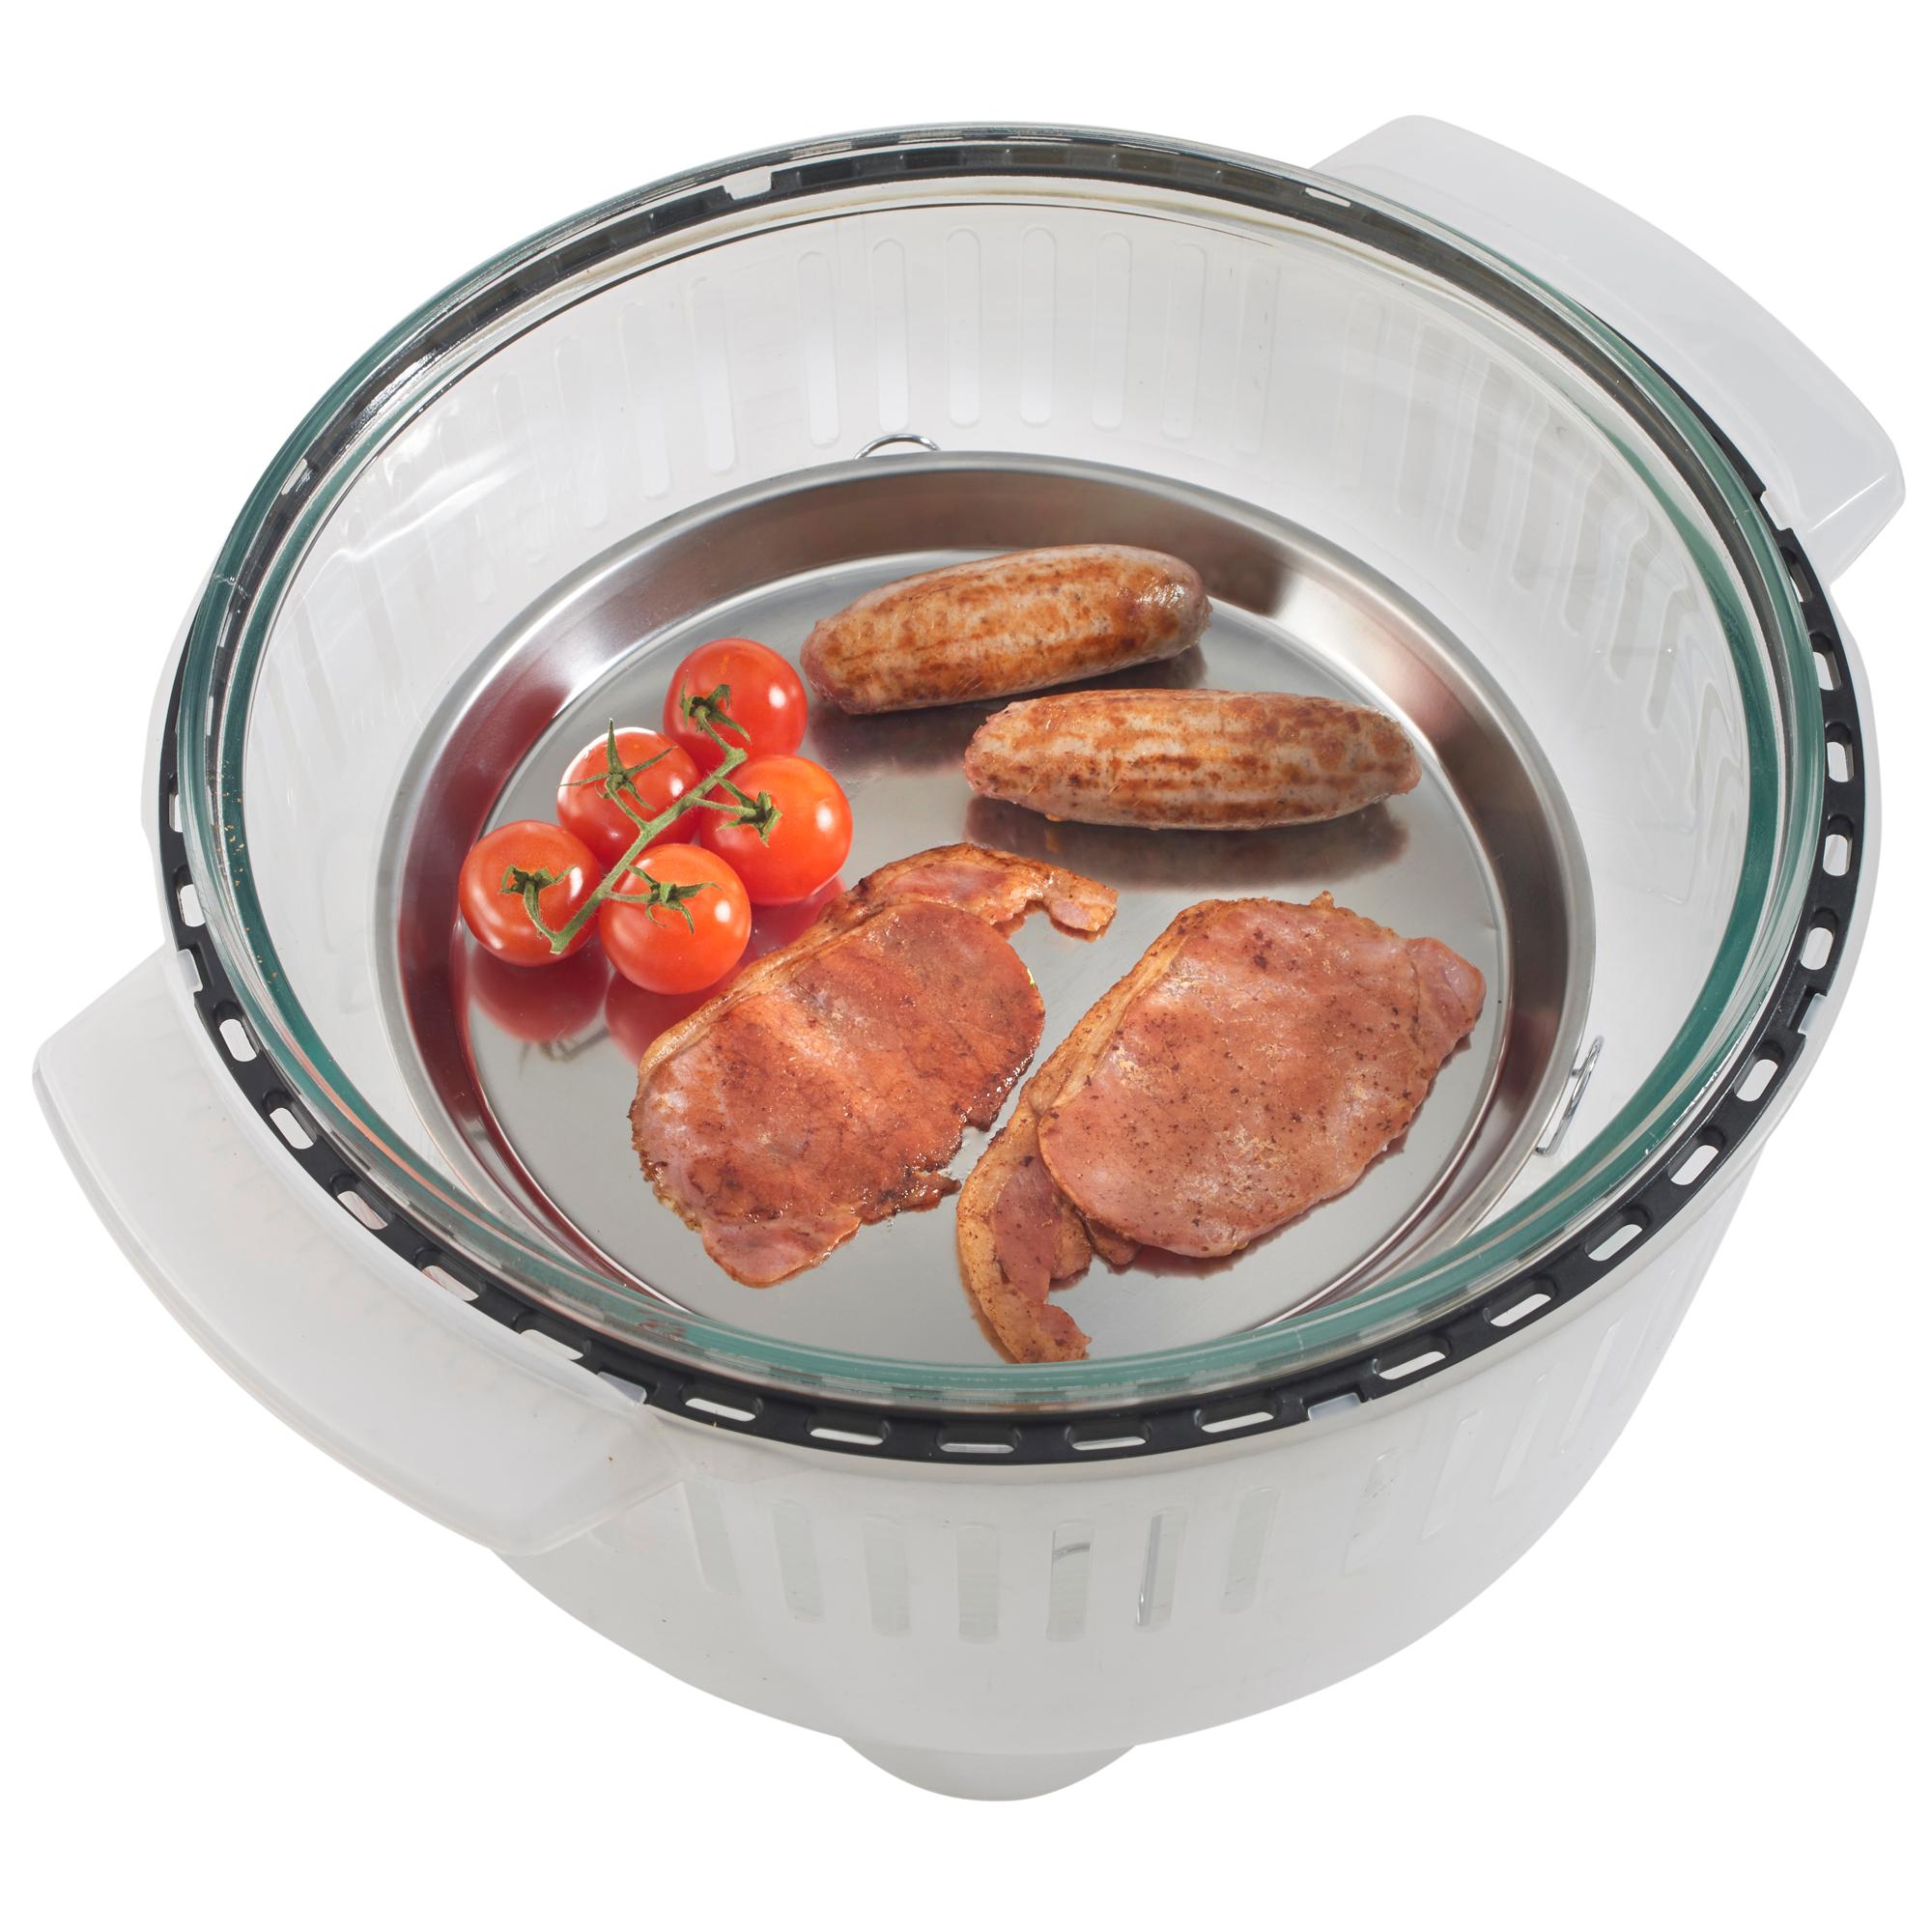 Roast Leg Of Lamb With Roasted Vegetables : Halogen Oven Recipes Thumbnail  Thumbnail